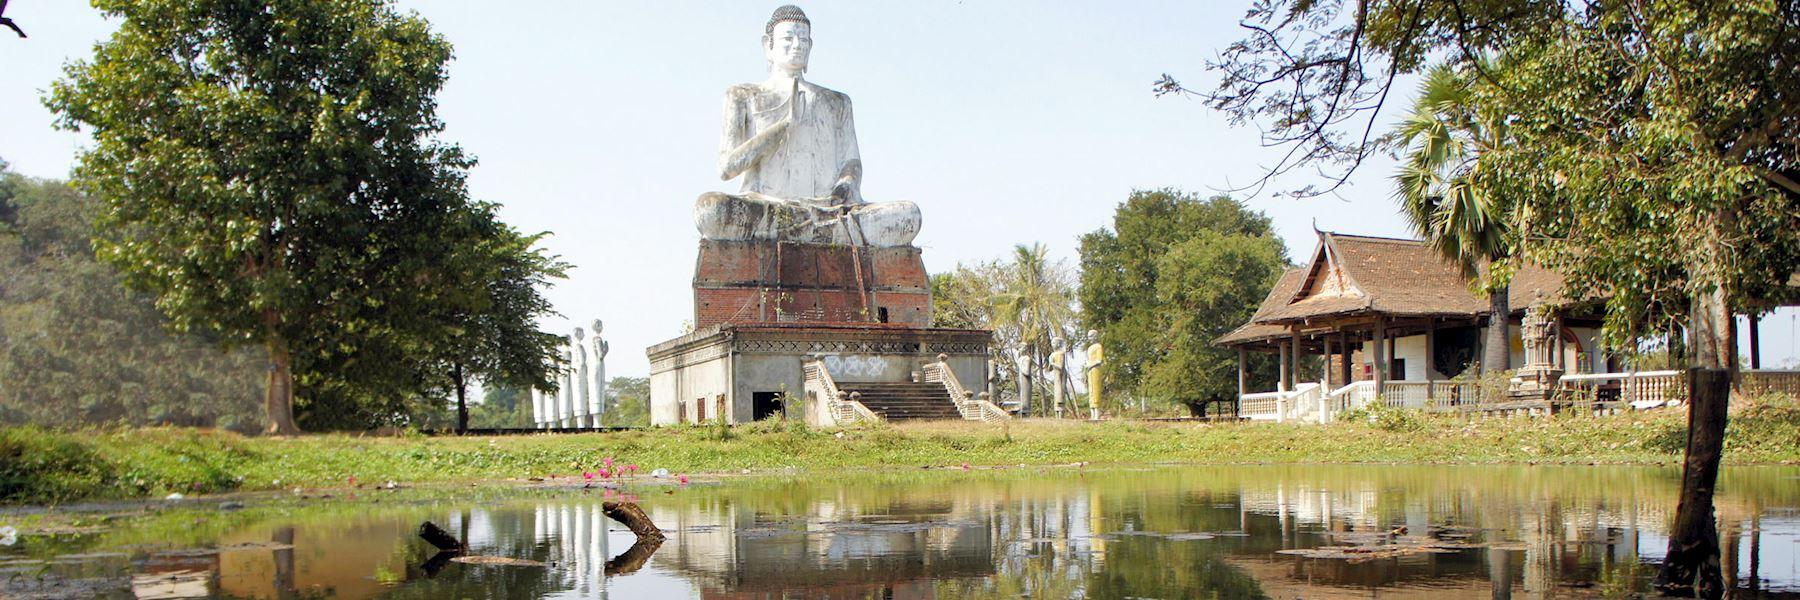 Visit Battambang, Cambodia